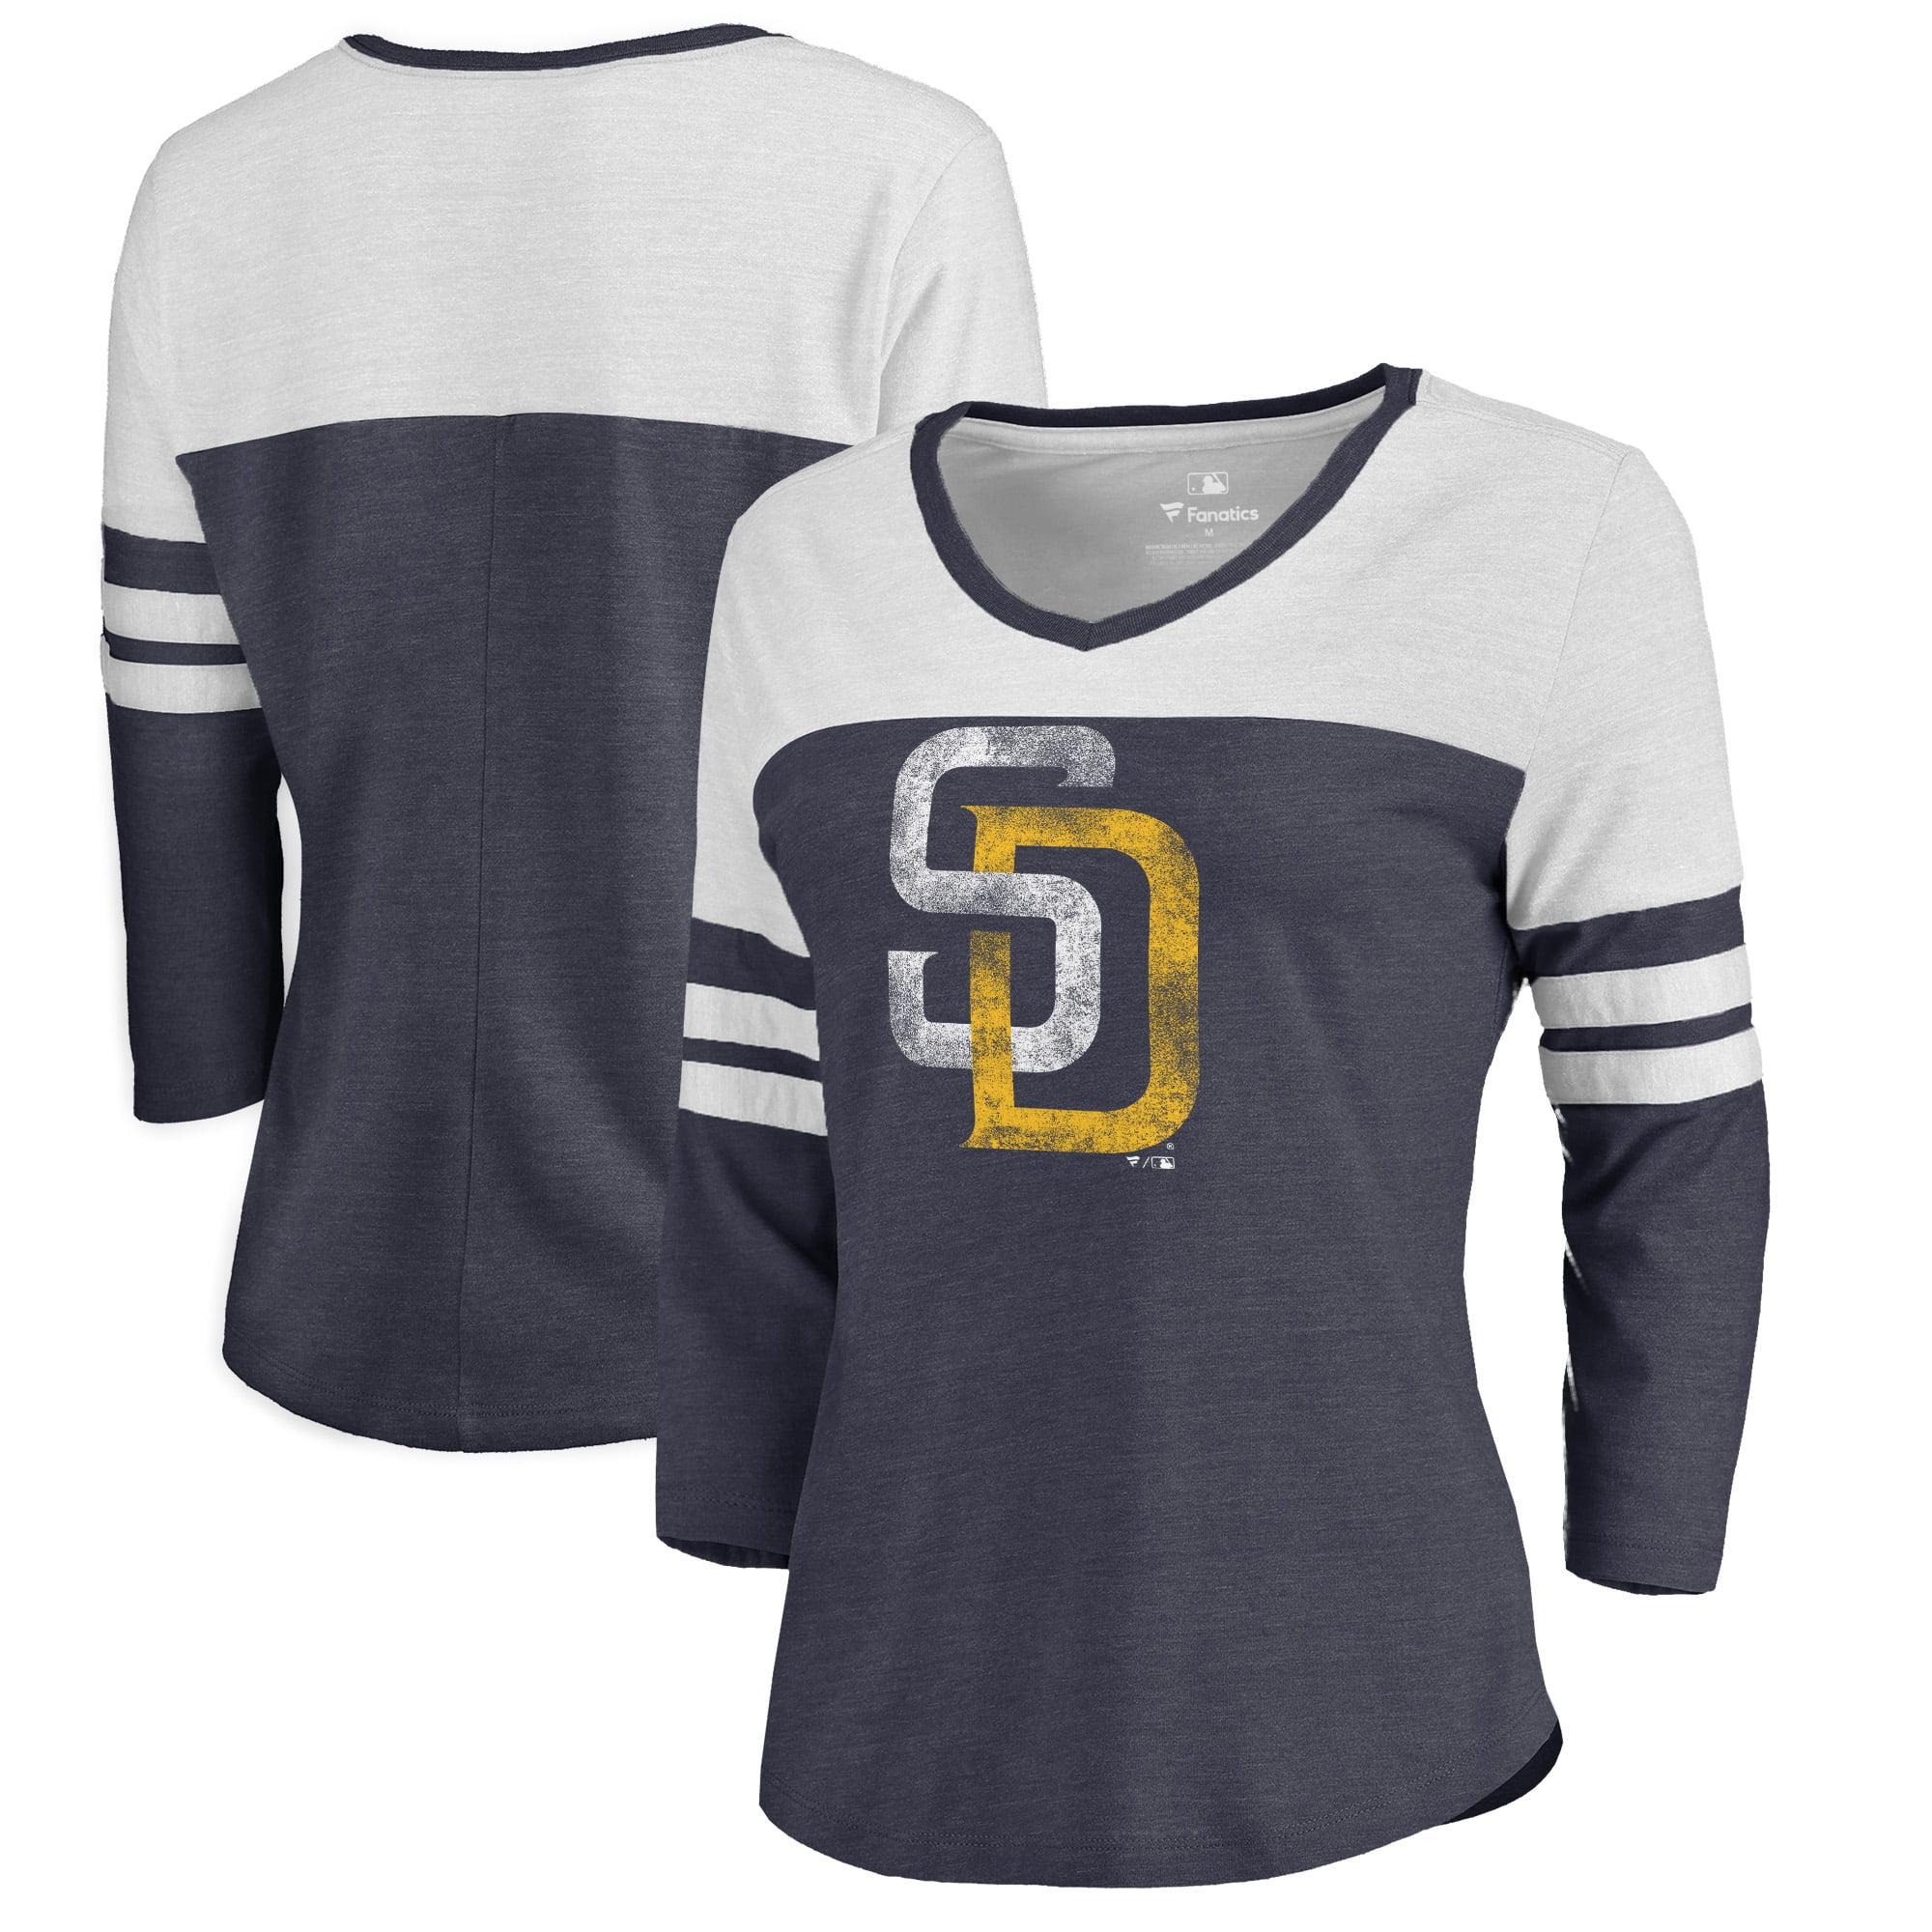 San Diego Padres Fanatics Branded Women's Distressed Team Logo 3/4 Sleeve Tri-Blend T-Shirt - Navy/White